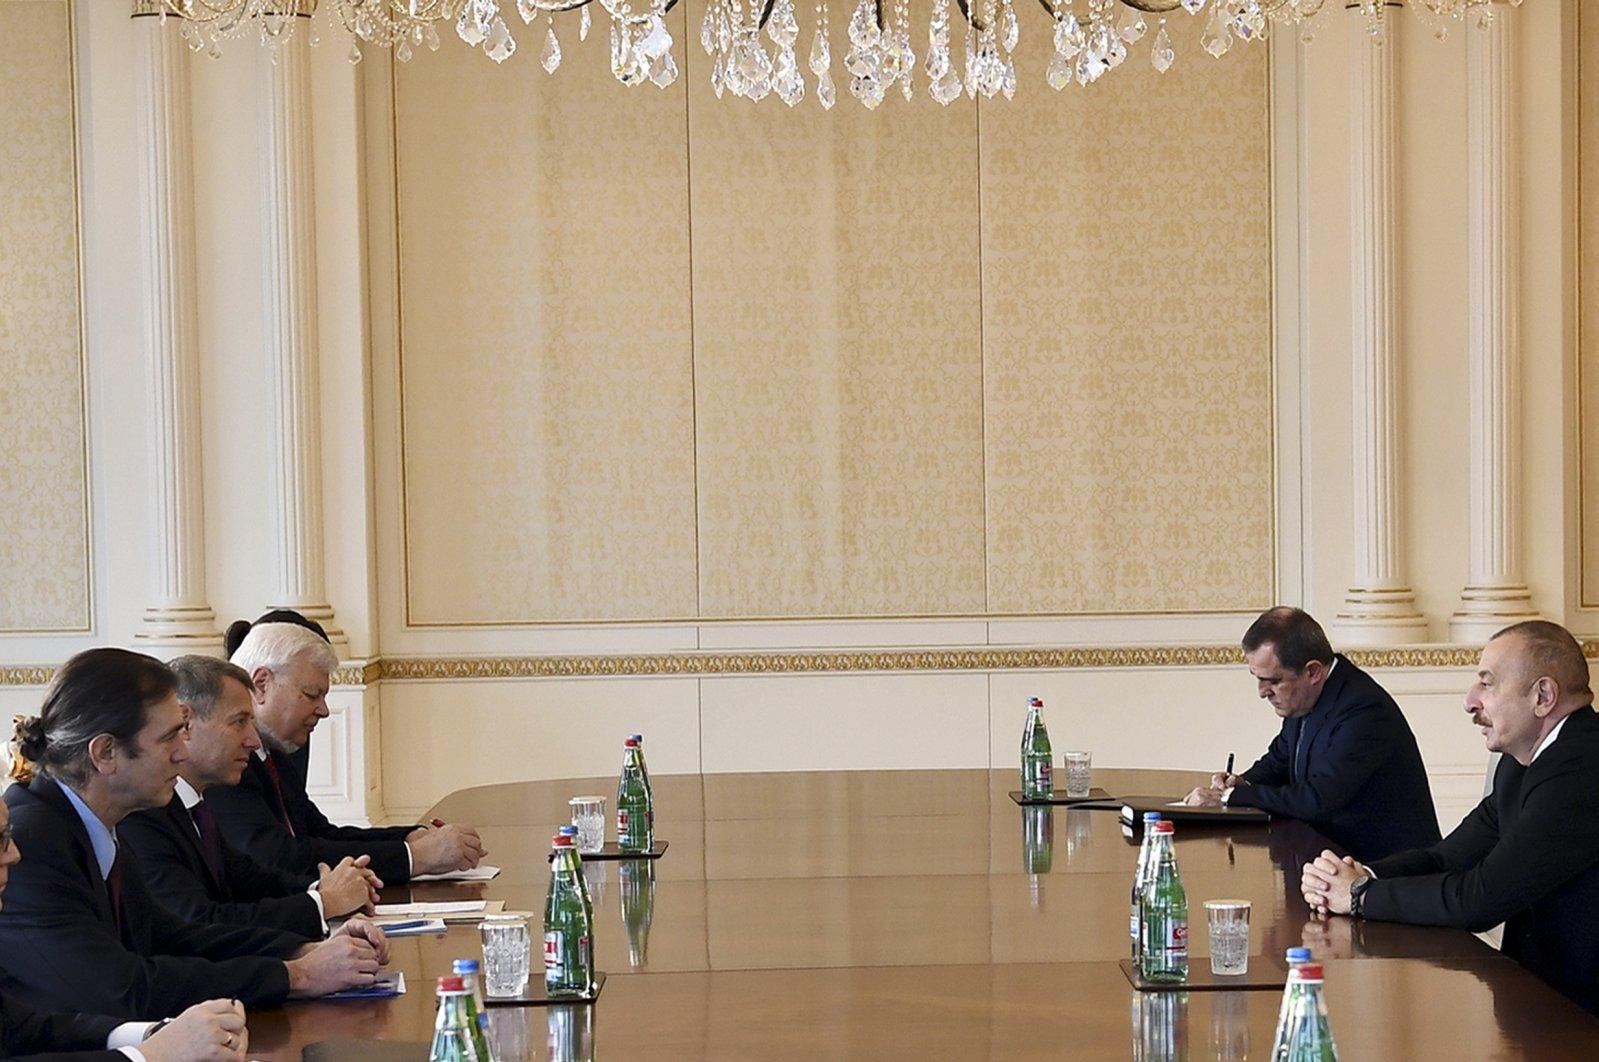 Azerbaijani President Ilham Aliyev (R), speaks to members of the OSCE Minsk Group co-chairs Stephane Visconti of France, Andrew Schofer of the U.S., Russian Ambassador to Azerbaijan Mikhail Bocharnikov and Personal Representative of the OSCE Chairperson-in-Office Andrzej Kasprzyk in Baku, Azerbaijan. (AP Photo)